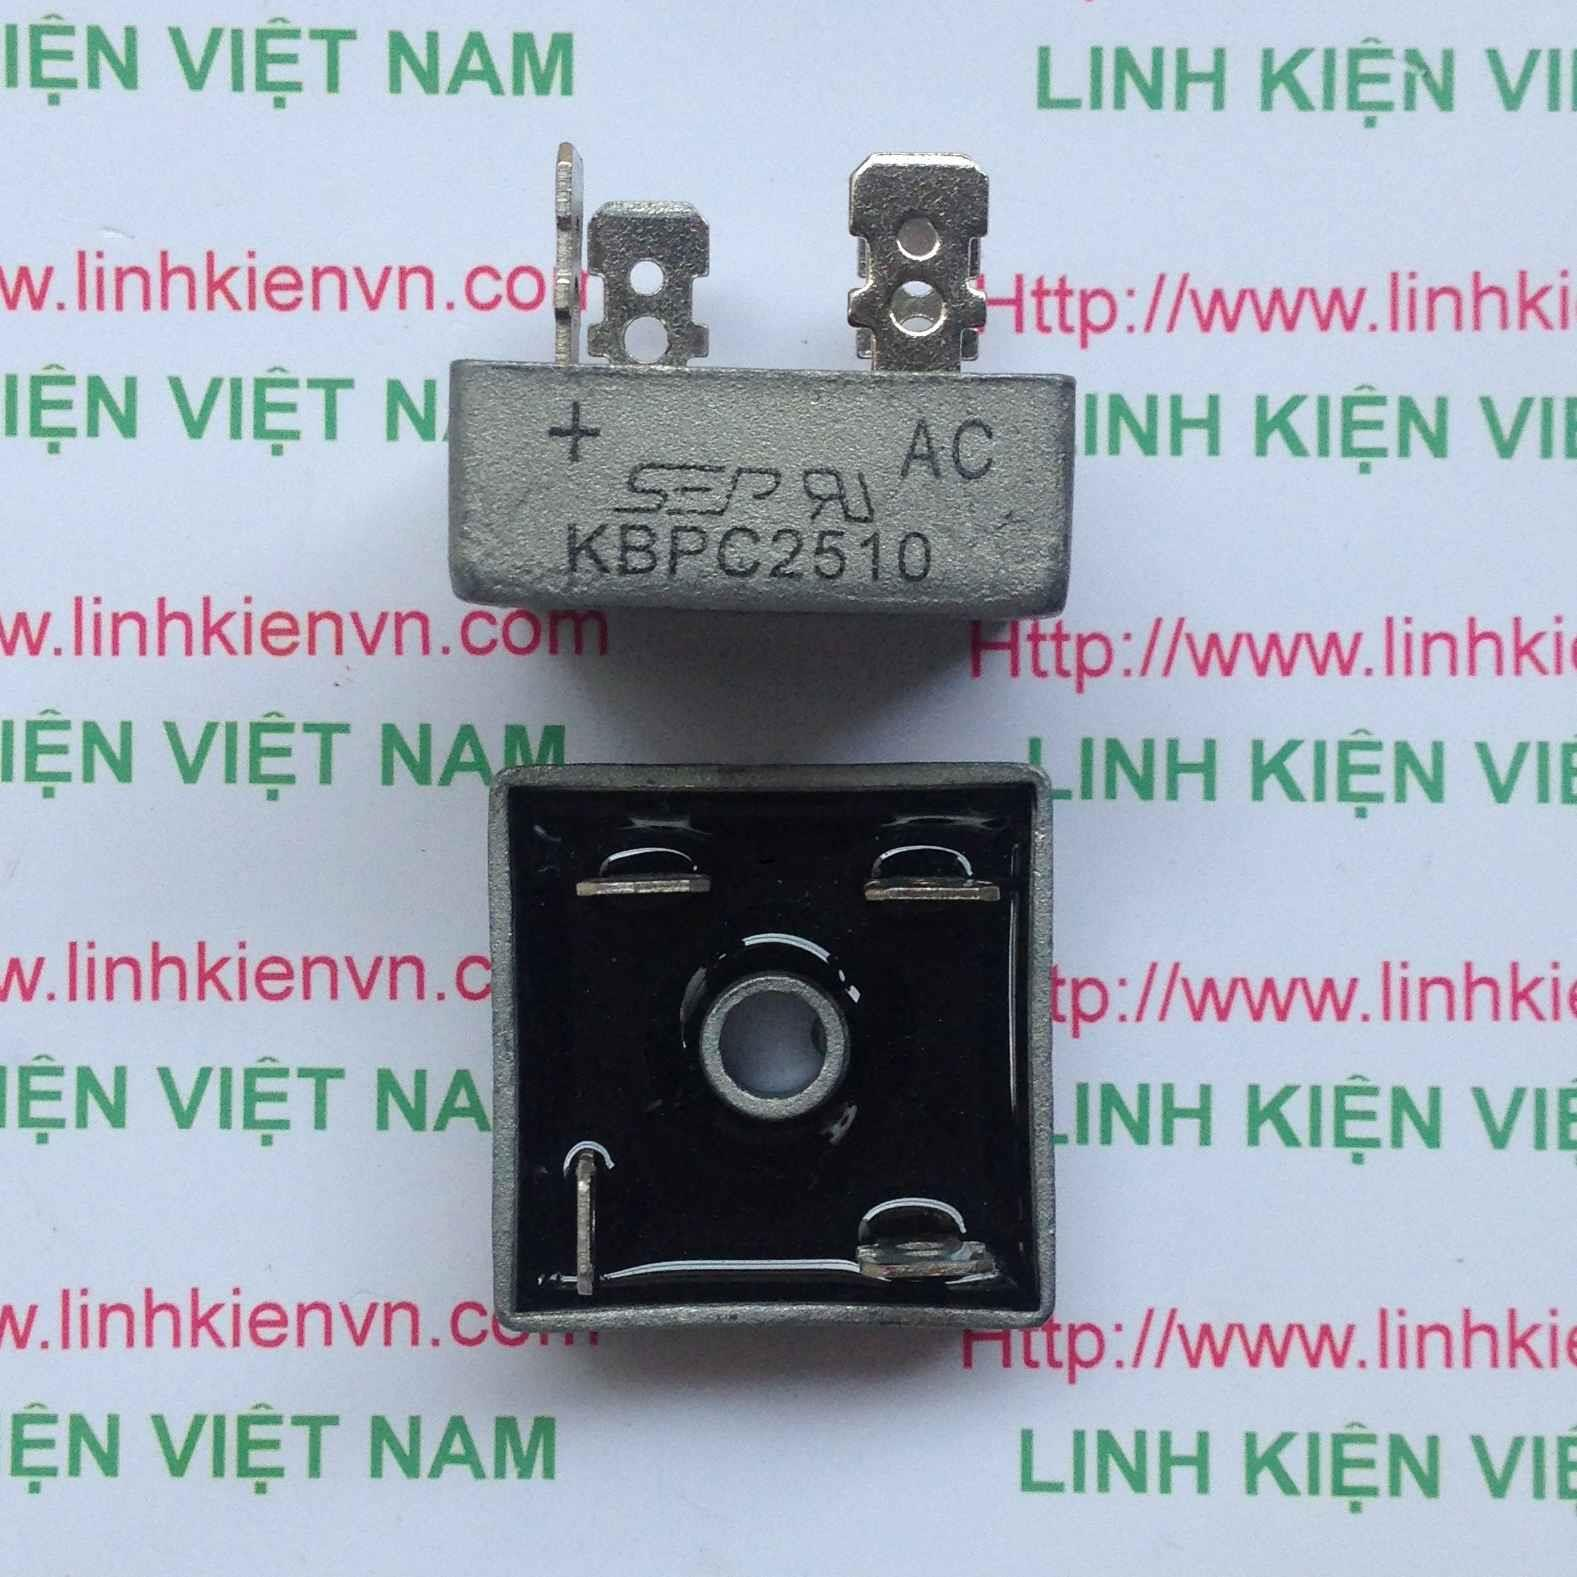 Diode Cầu KBPC2510 25A 1000V - B6H18(KB3H3)